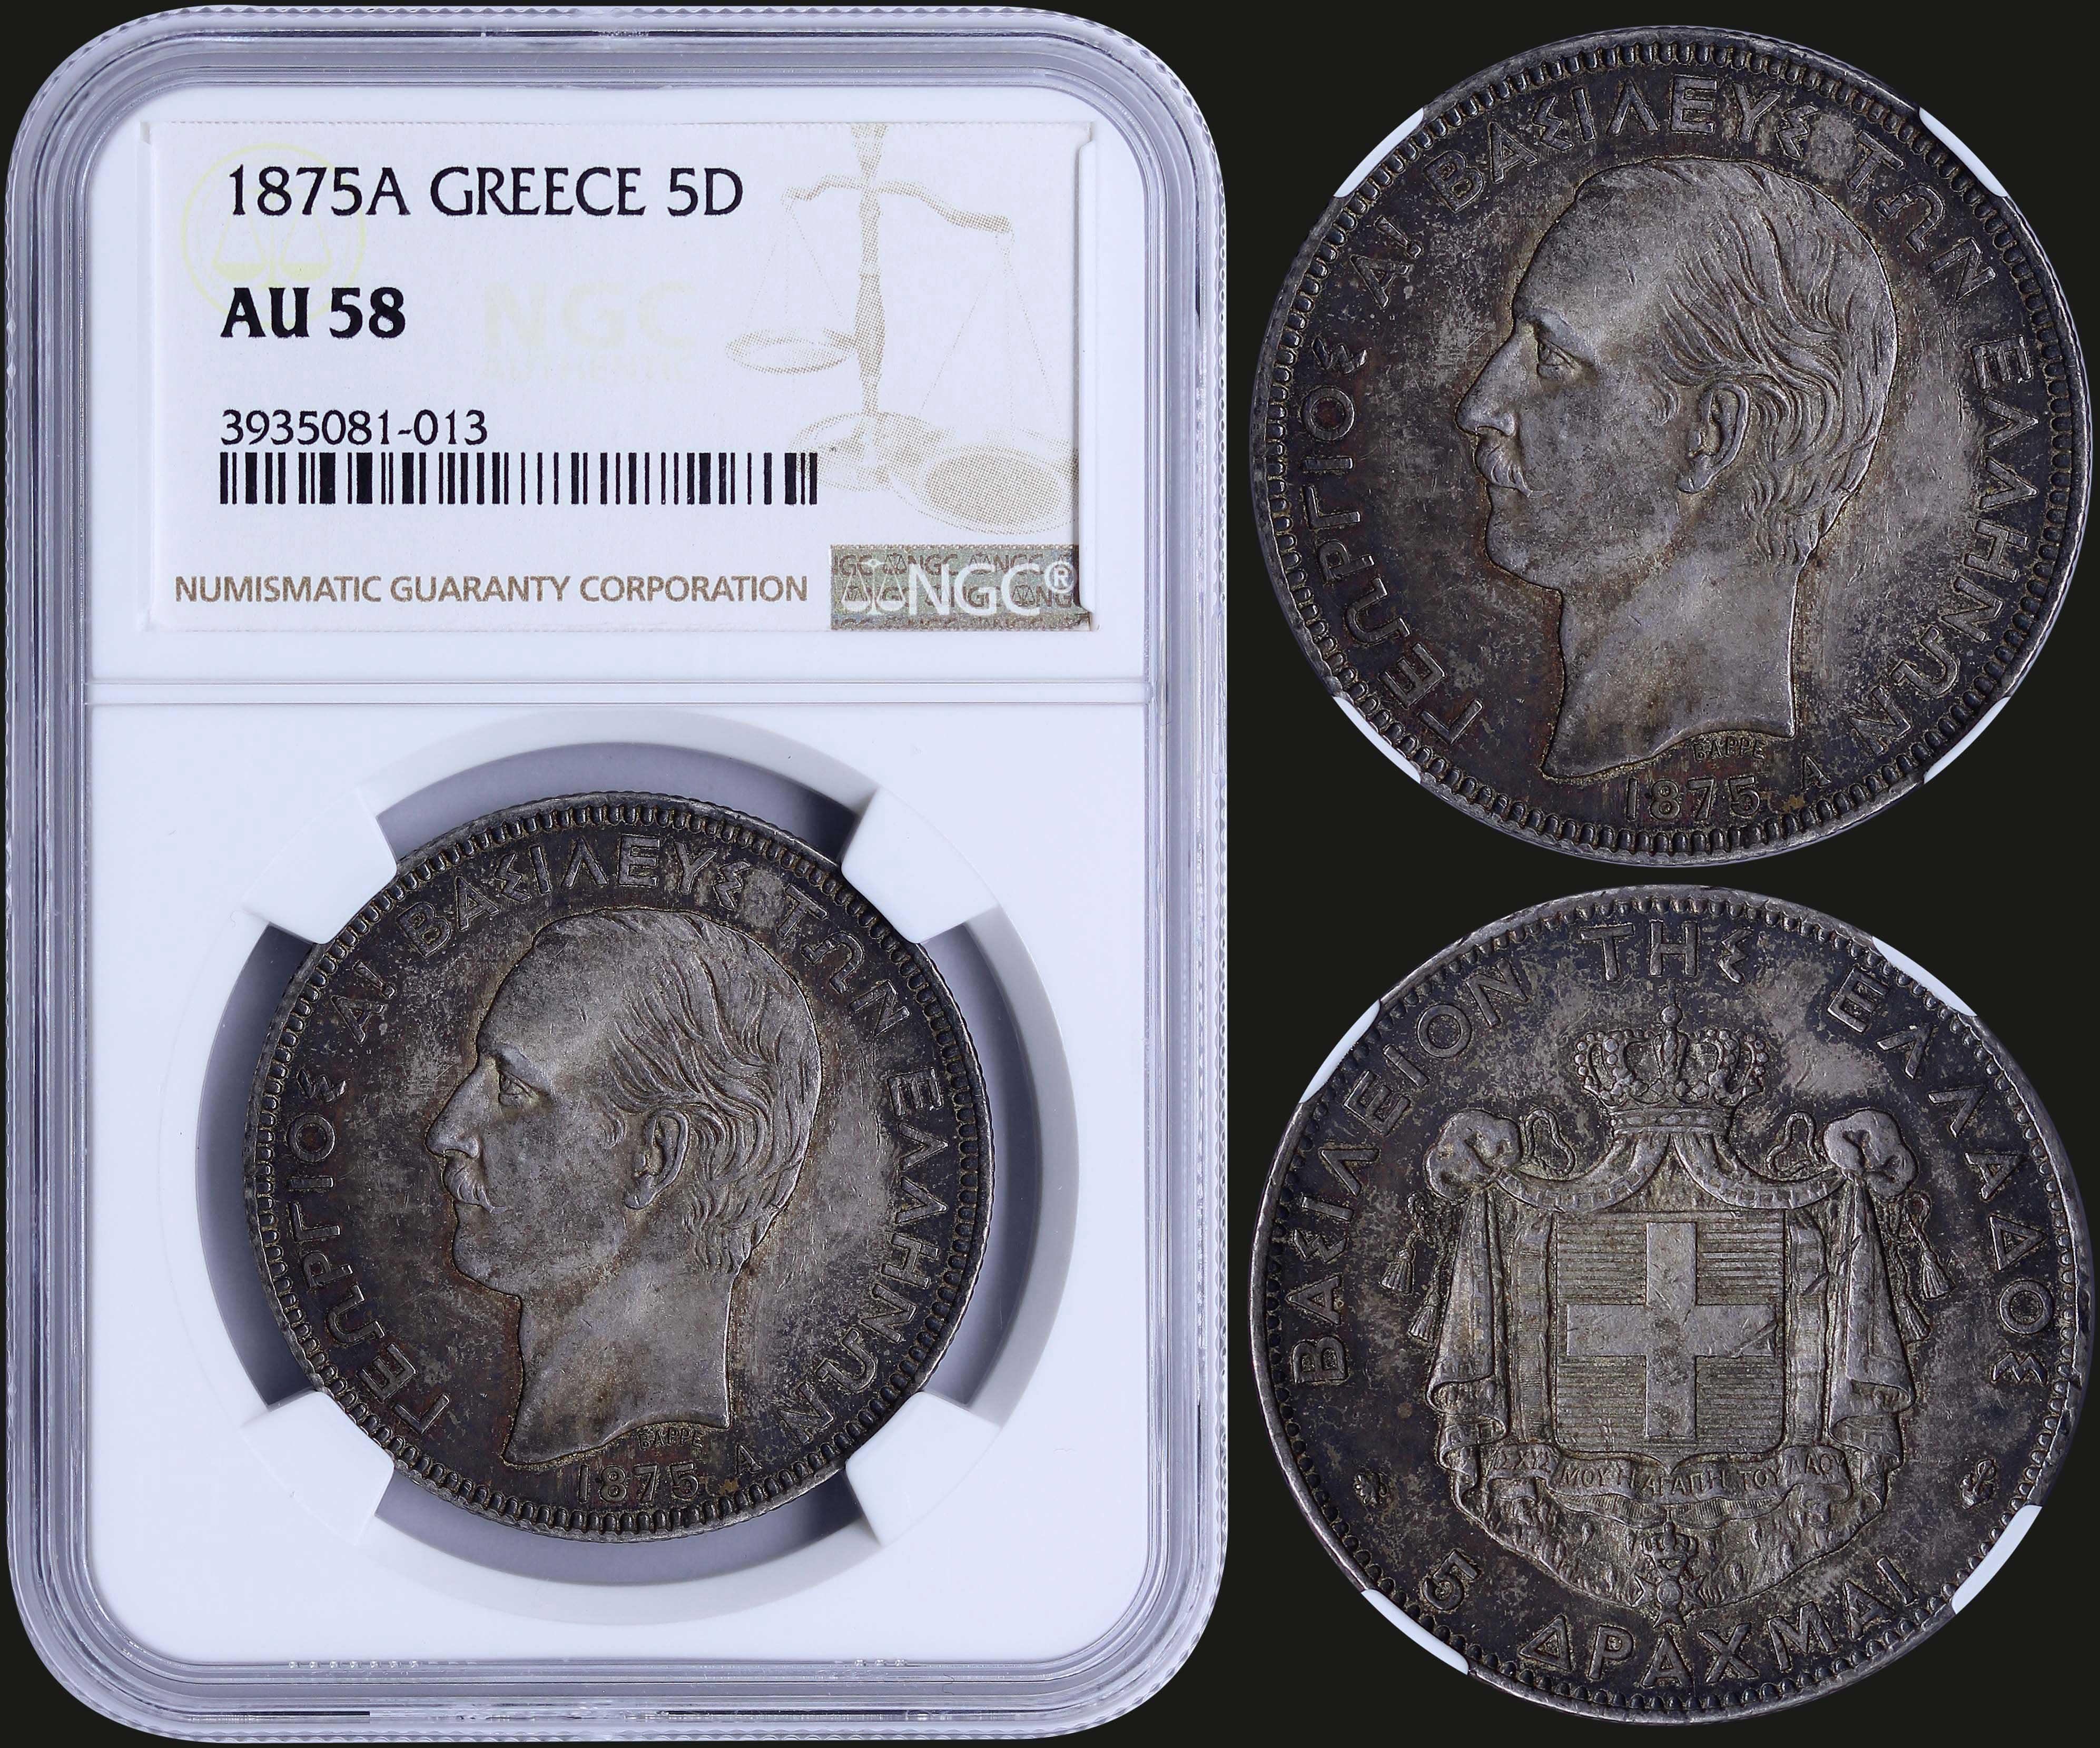 Lot 8128 - -  COINS & TOKENS king george i -  A. Karamitsos Public & Live Bid Auction 644 Coins, Medals & Banknotes